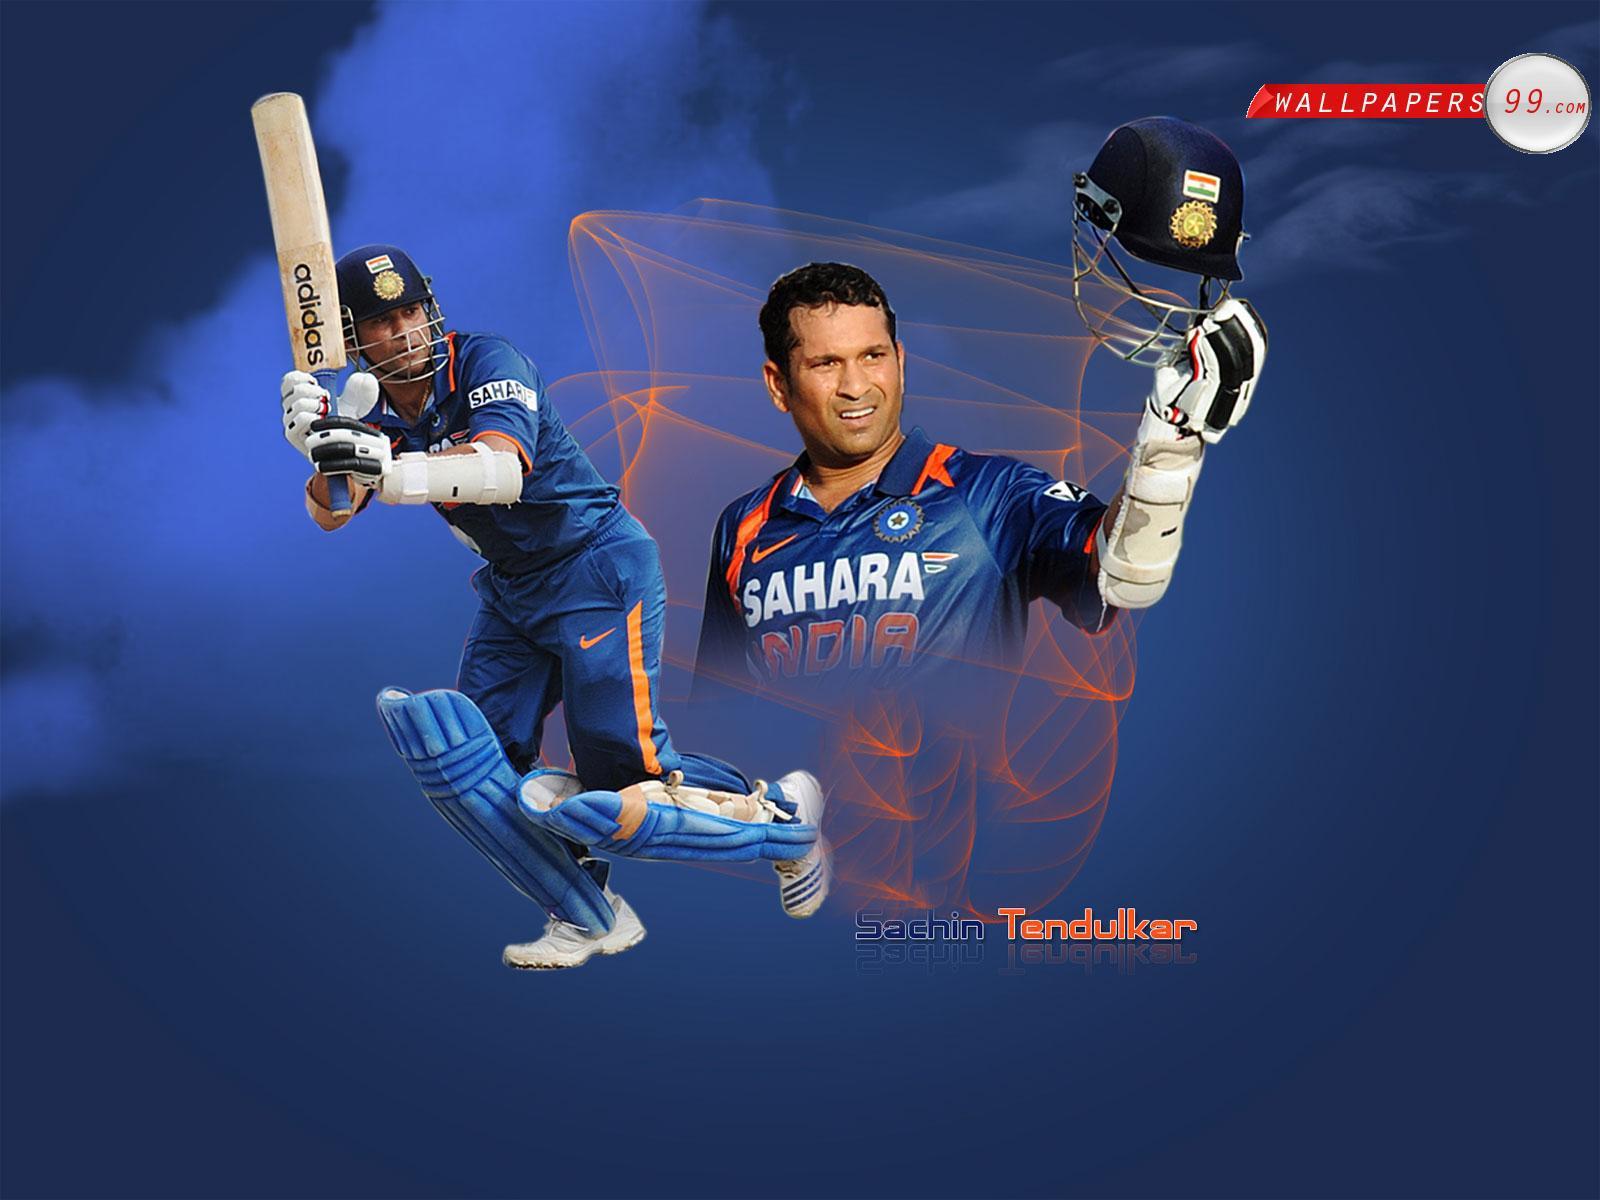 Sachin Tendulkar Wallpapers HD Free Download Sachin Tendulkar Wallpapers High Quality